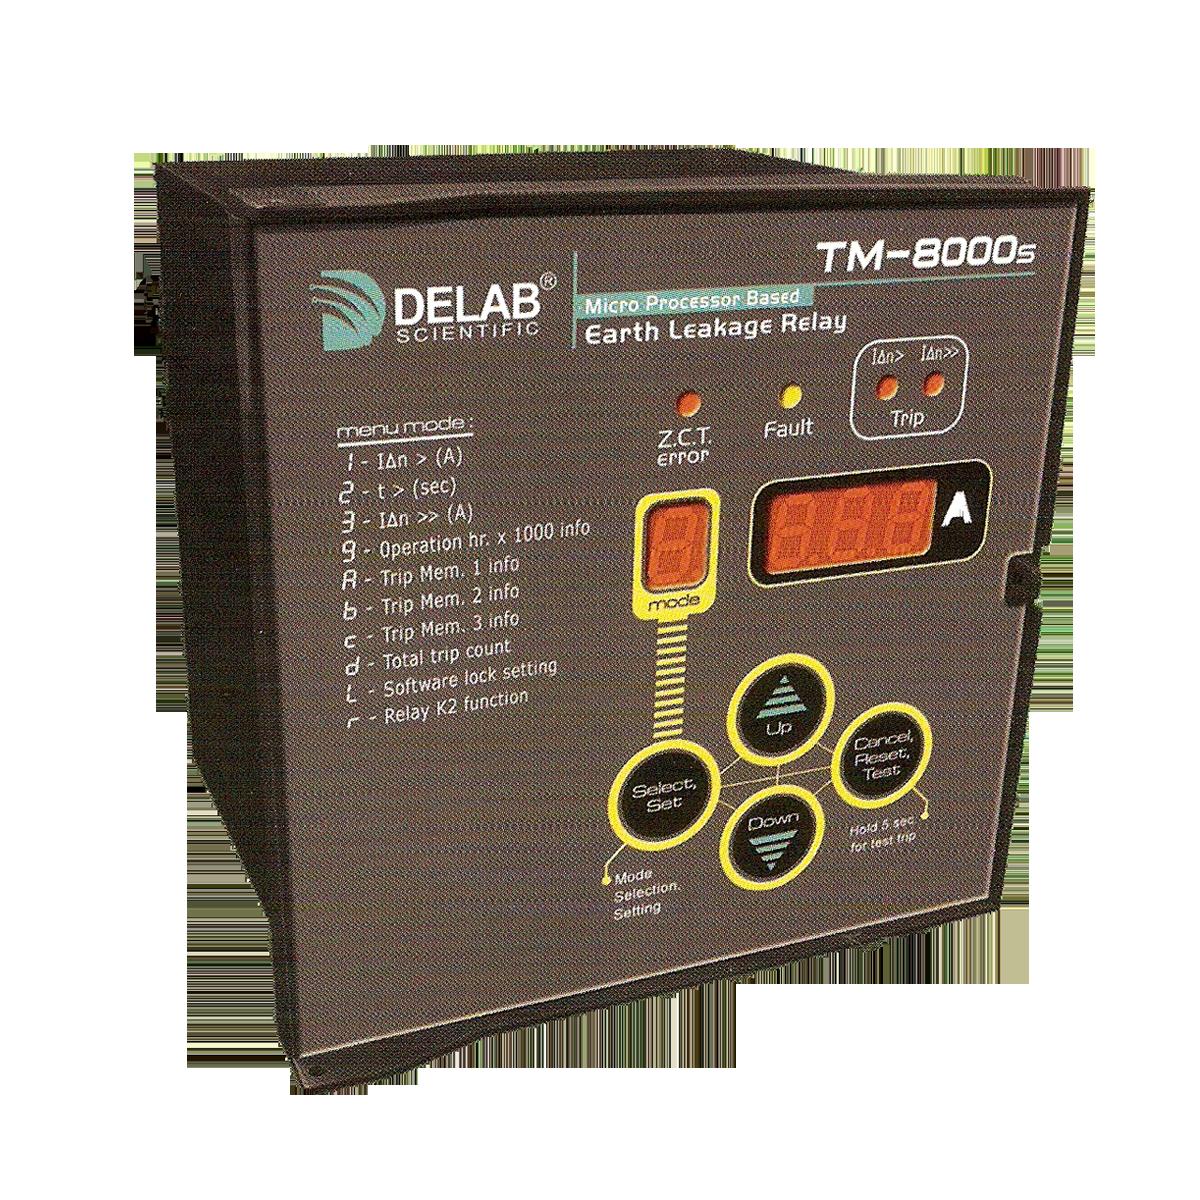 Delab Scientific Earth Protection Relay Digital Microprocessors Leakage Wiring Diagram Tm 8000s